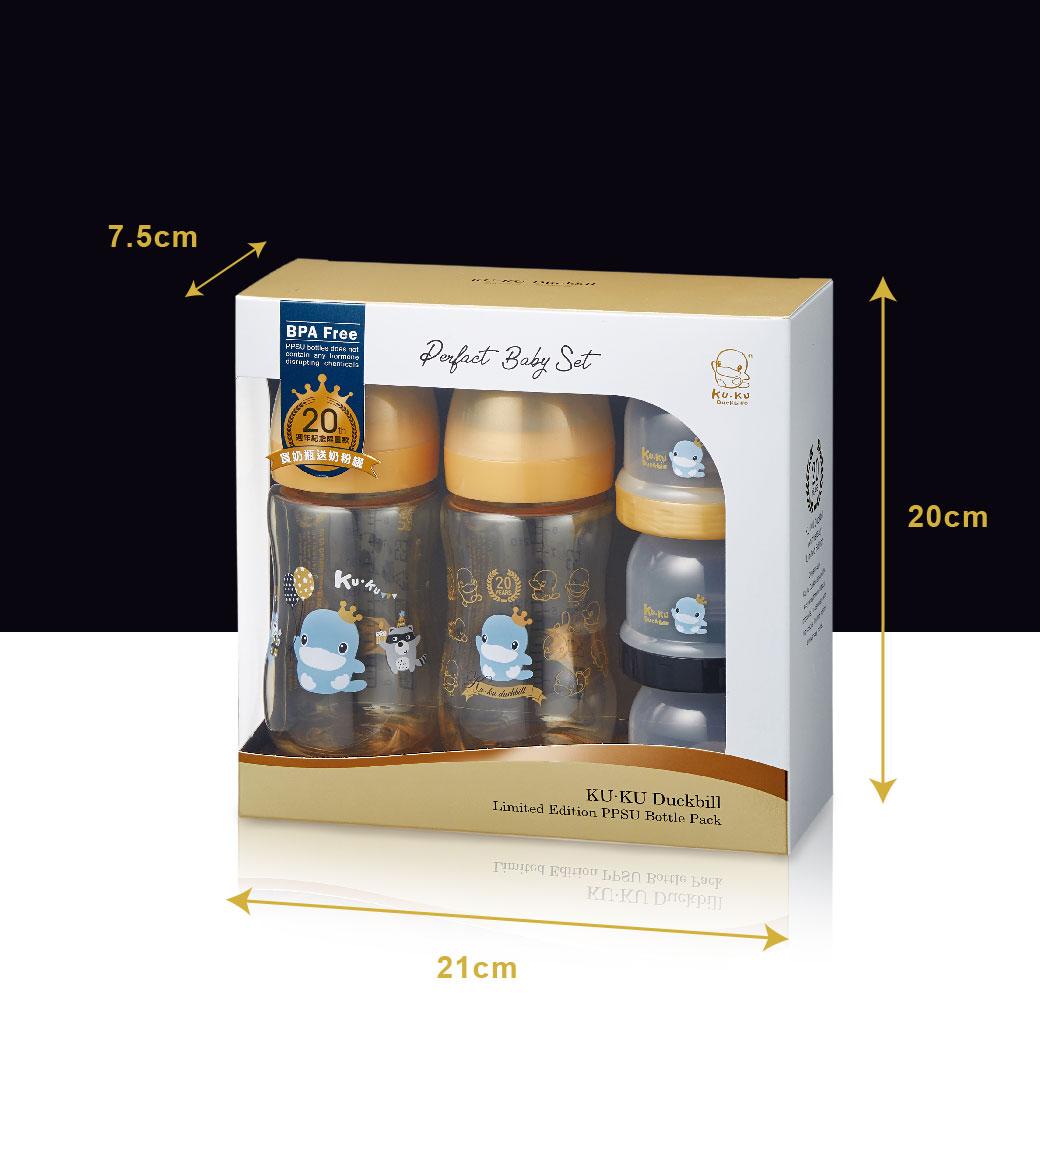 proimages/bottles/PPSU/5879/5879--20週年PPSU奶瓶組-EDM-14.jpg